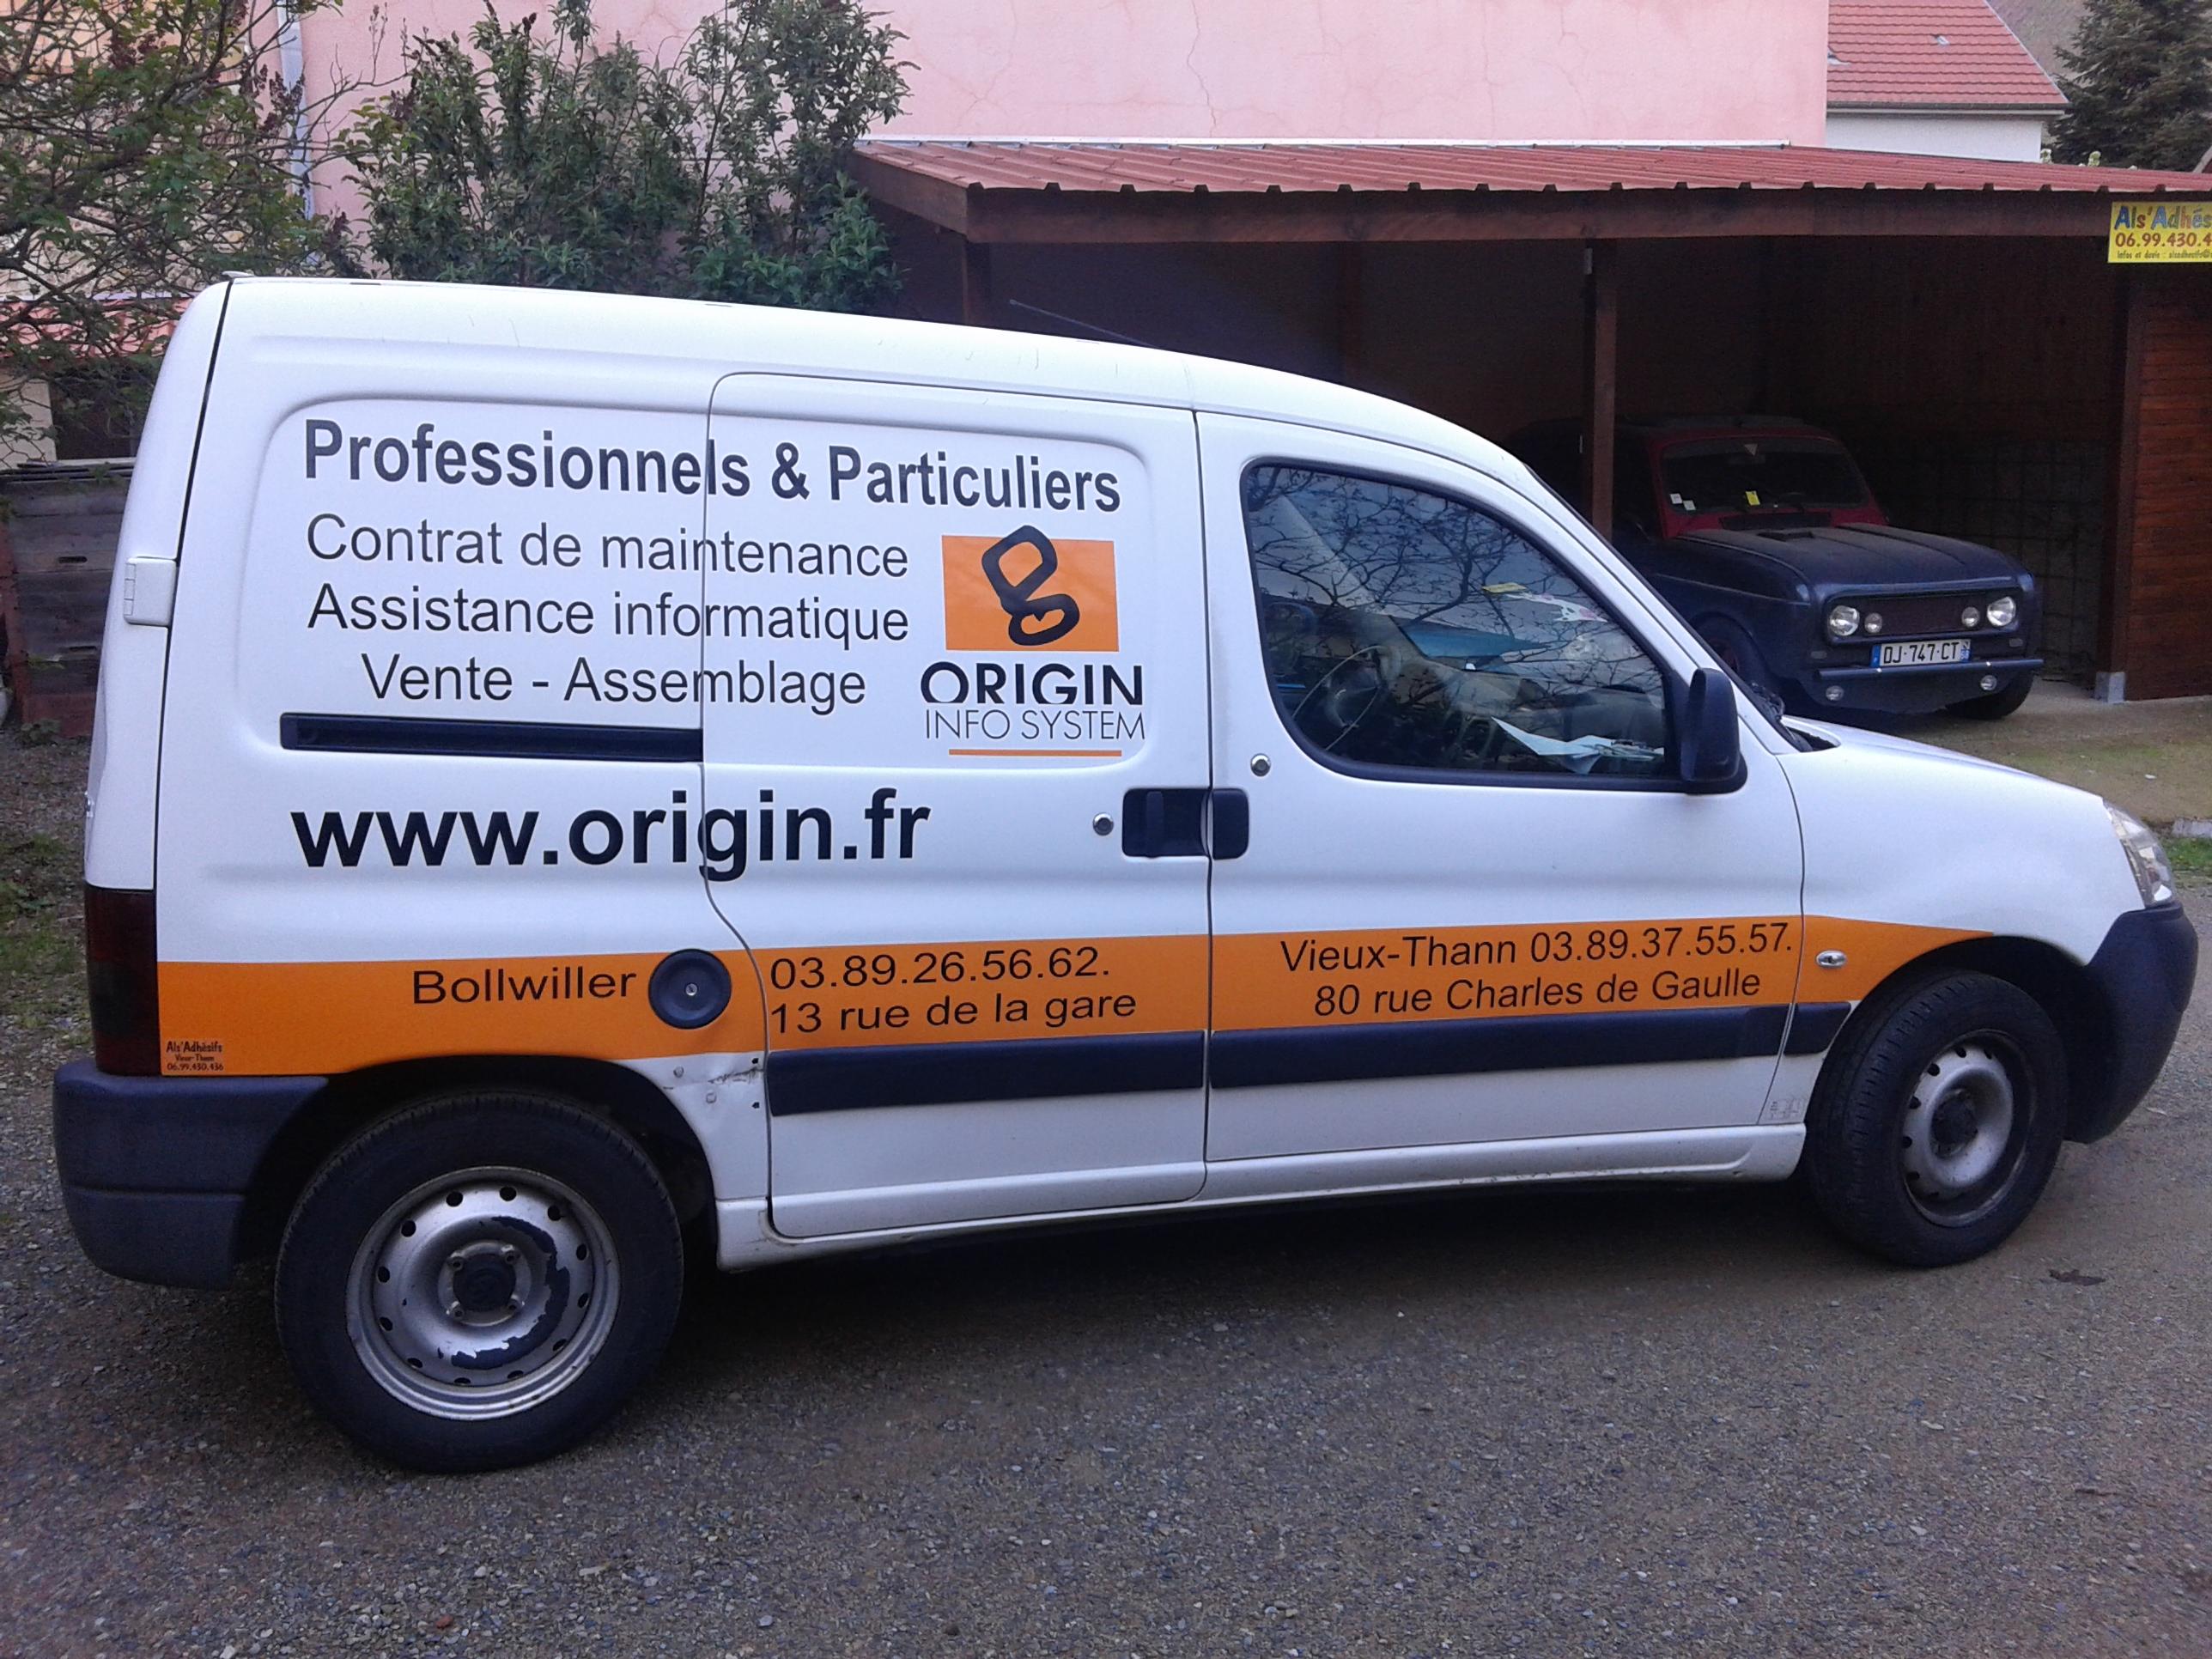 Partner Origin info system